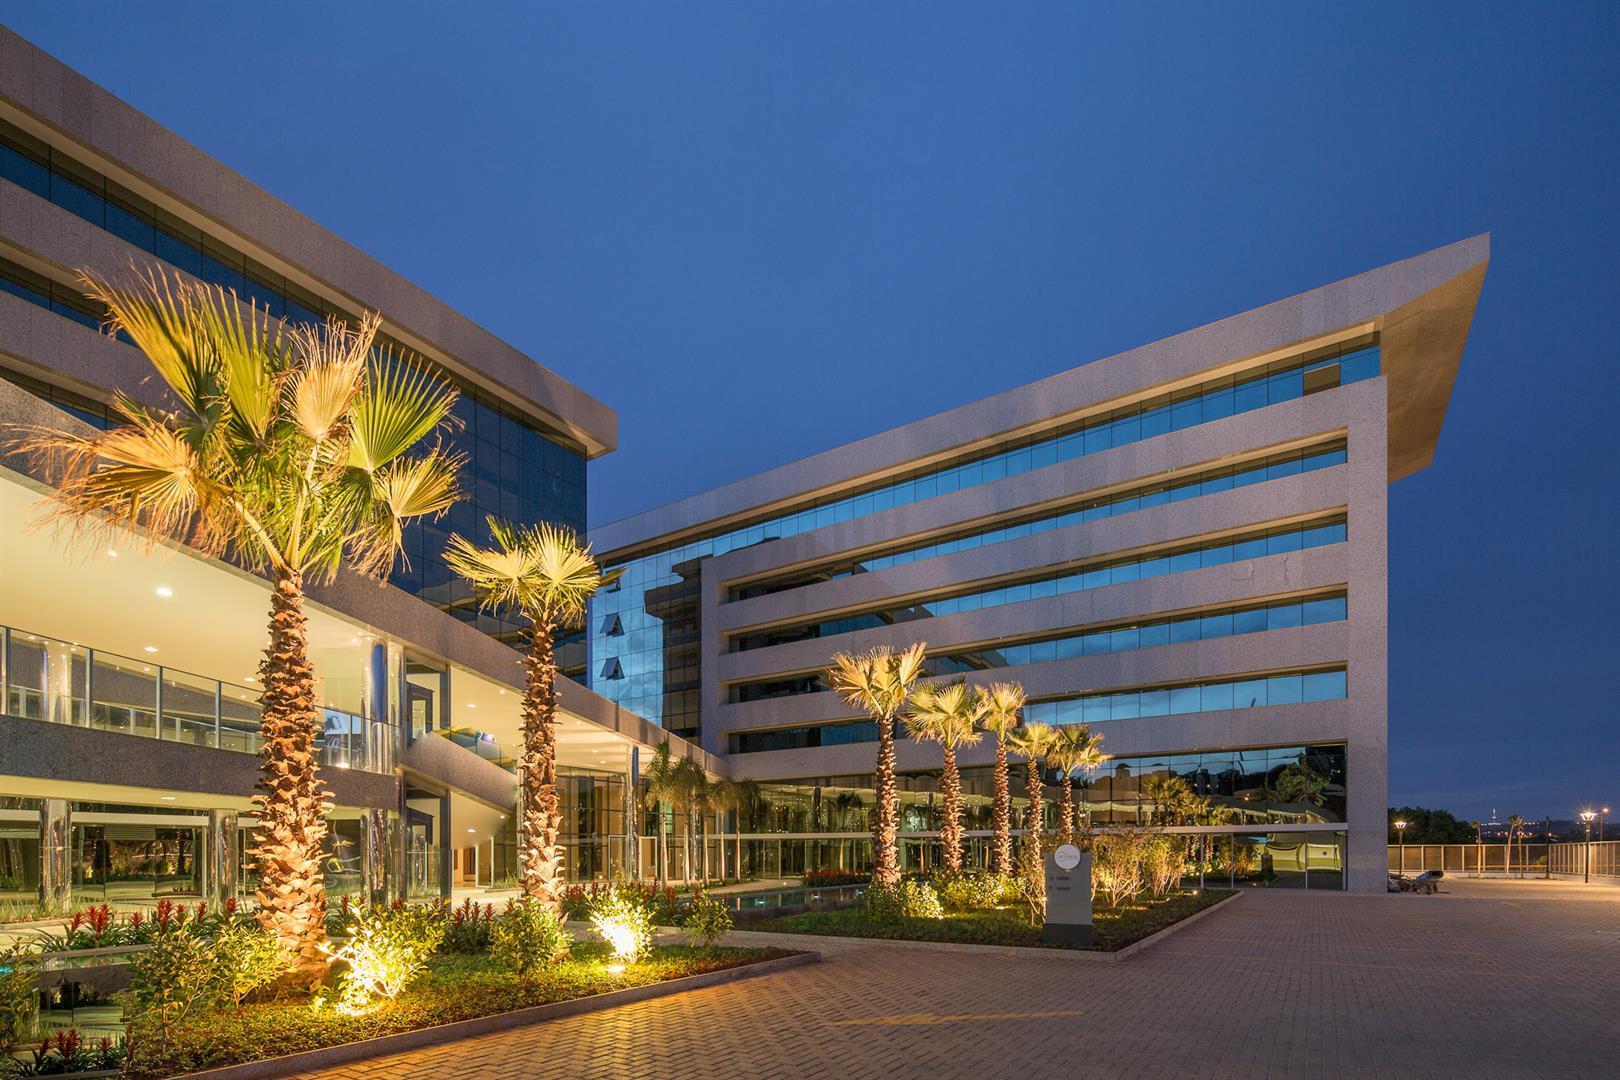 Imóvel pronto | Biosphere – Salas Comerciaisna  Asa Norte  - Brasília - Distrito Federal